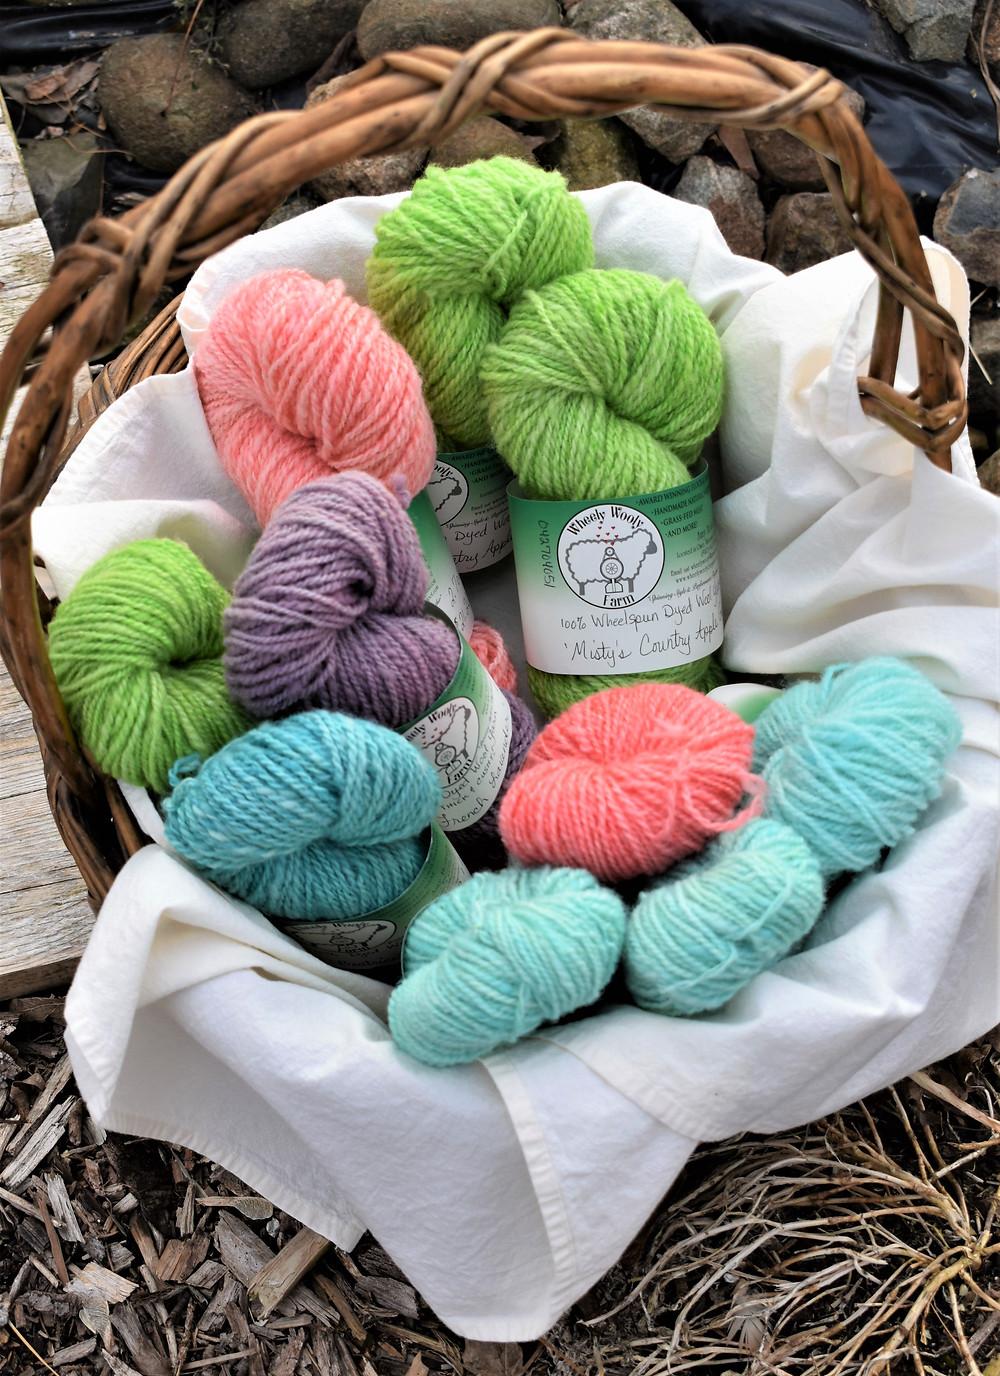 100% Wheelspun Yarn from Wheely Wooly Farm Spring